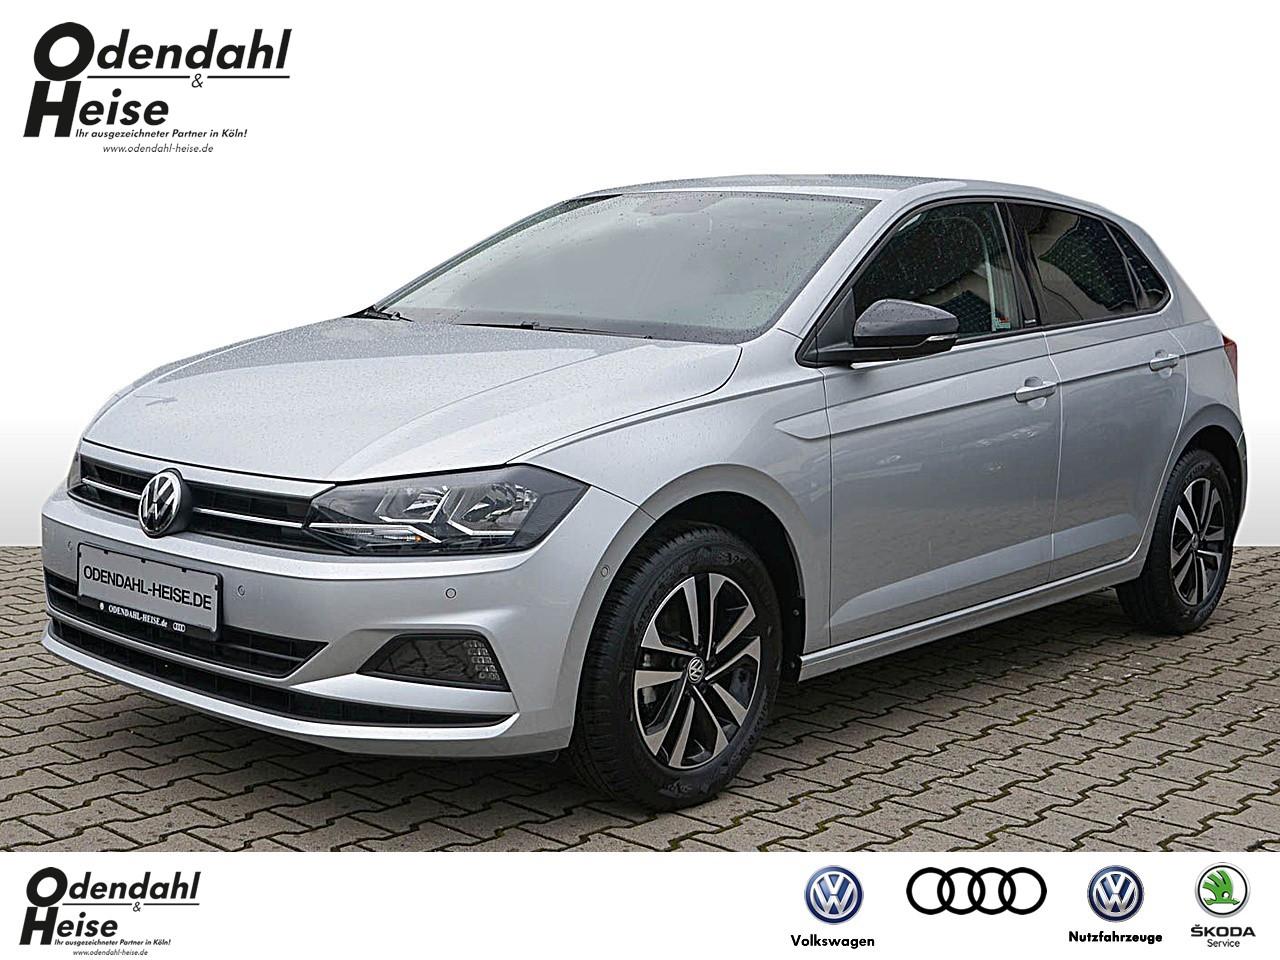 Volkswagen Polo IQ.DRIVE 1,0 l TSI OPF 70 kW (95 PS) 5-Gang, Jahr 2019, Benzin